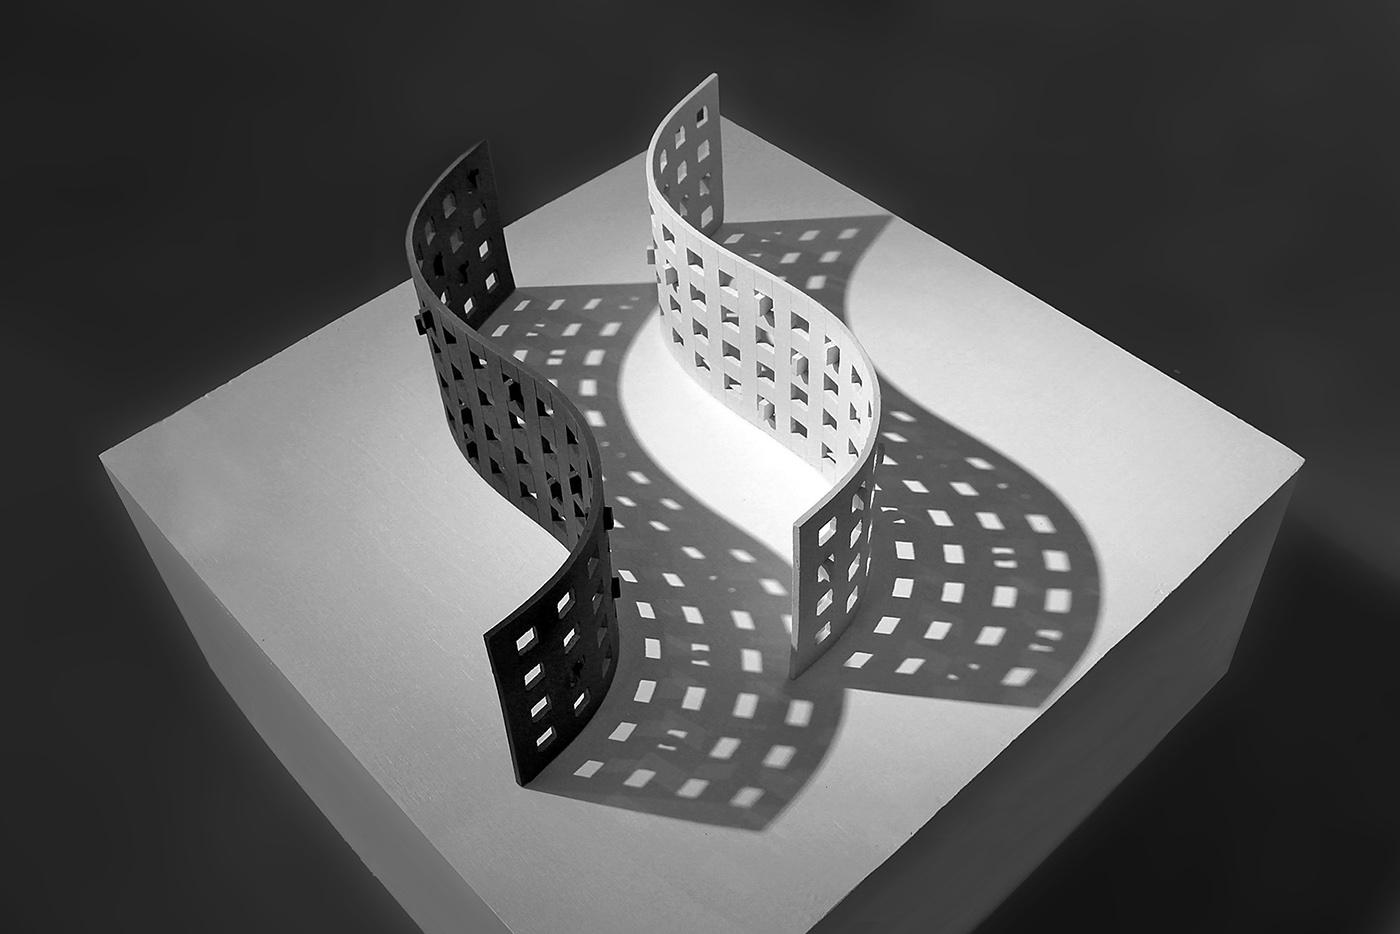 sculpture ceramic sculpture slab build abstract sculpture stoneware geometry Marek Jacisin OFA at Harvard Harvard Ceramics inspire